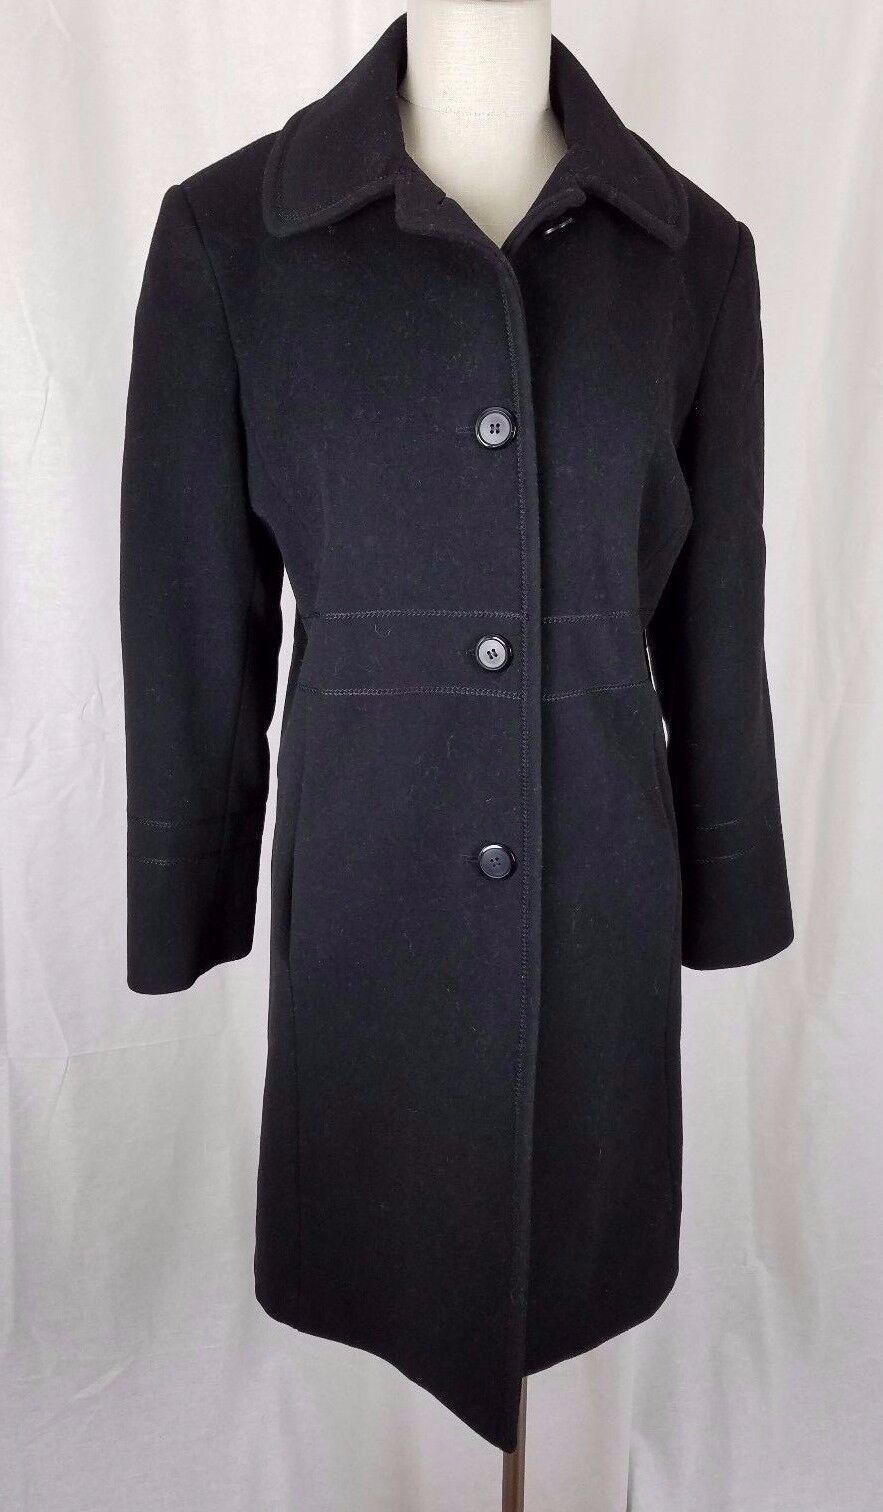 Vintage Jg Haken Winter Wolle Kaschmir Exposed Nähte Mantel Damen 12 Schwarz